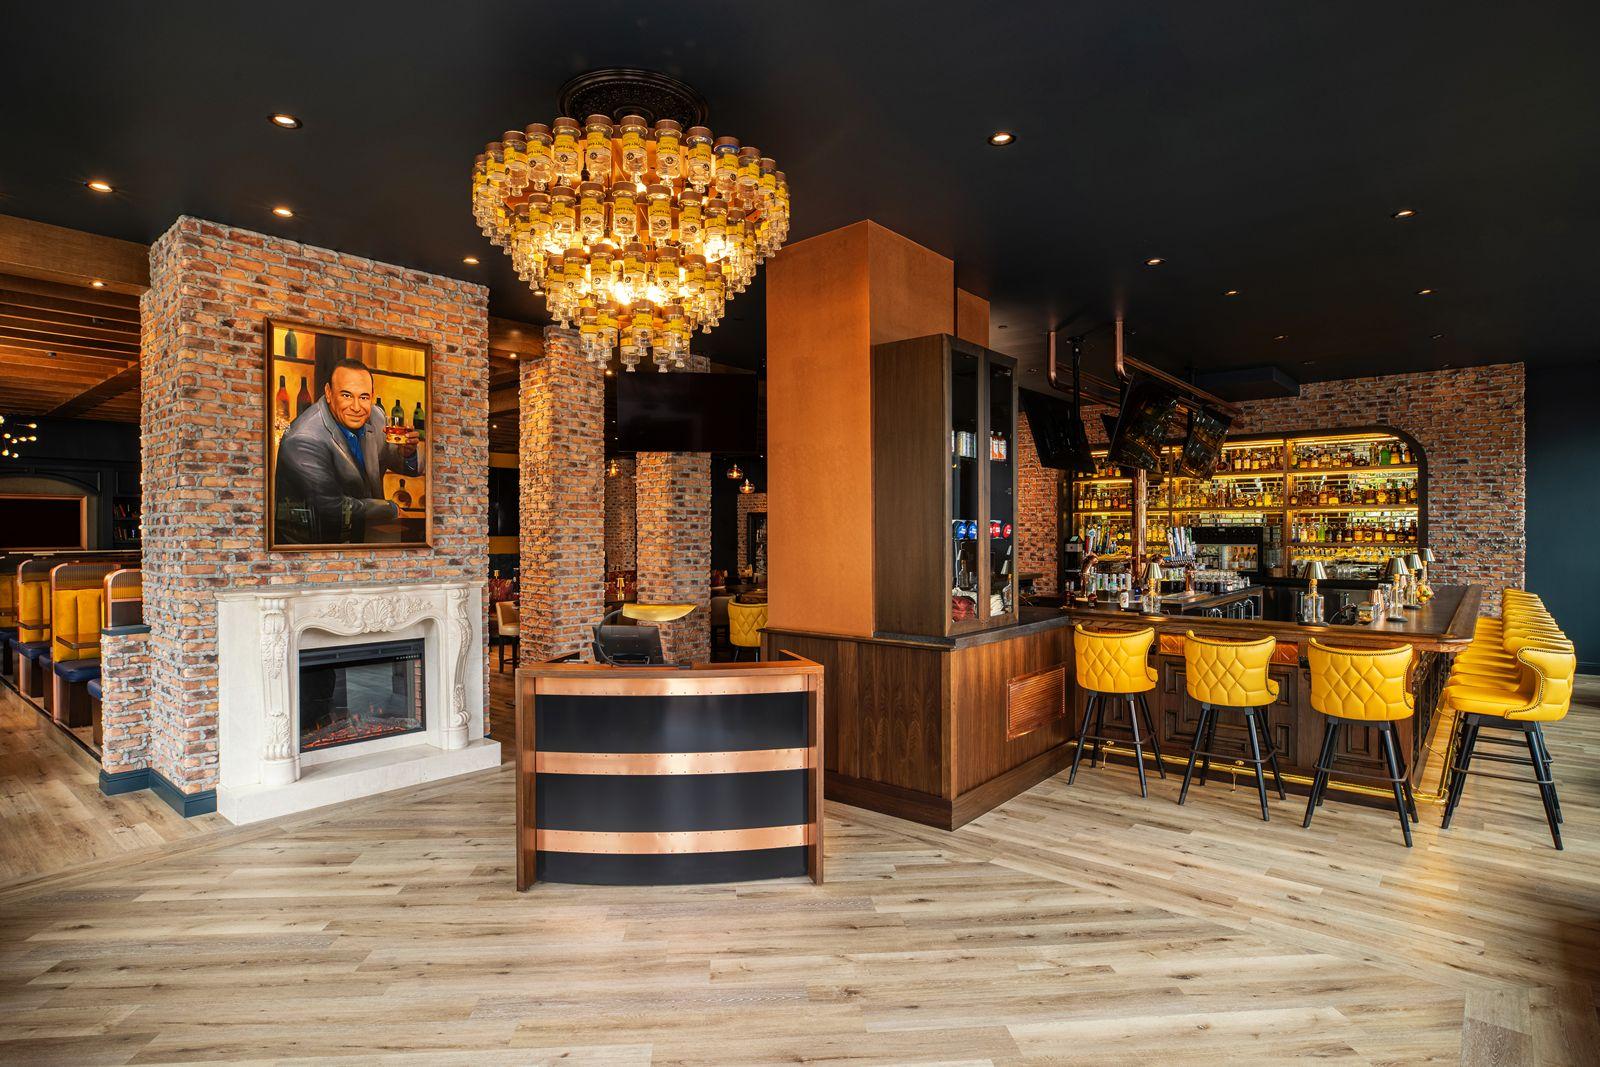 Taffer's Tavern Announces First Location in Washington, D.C.